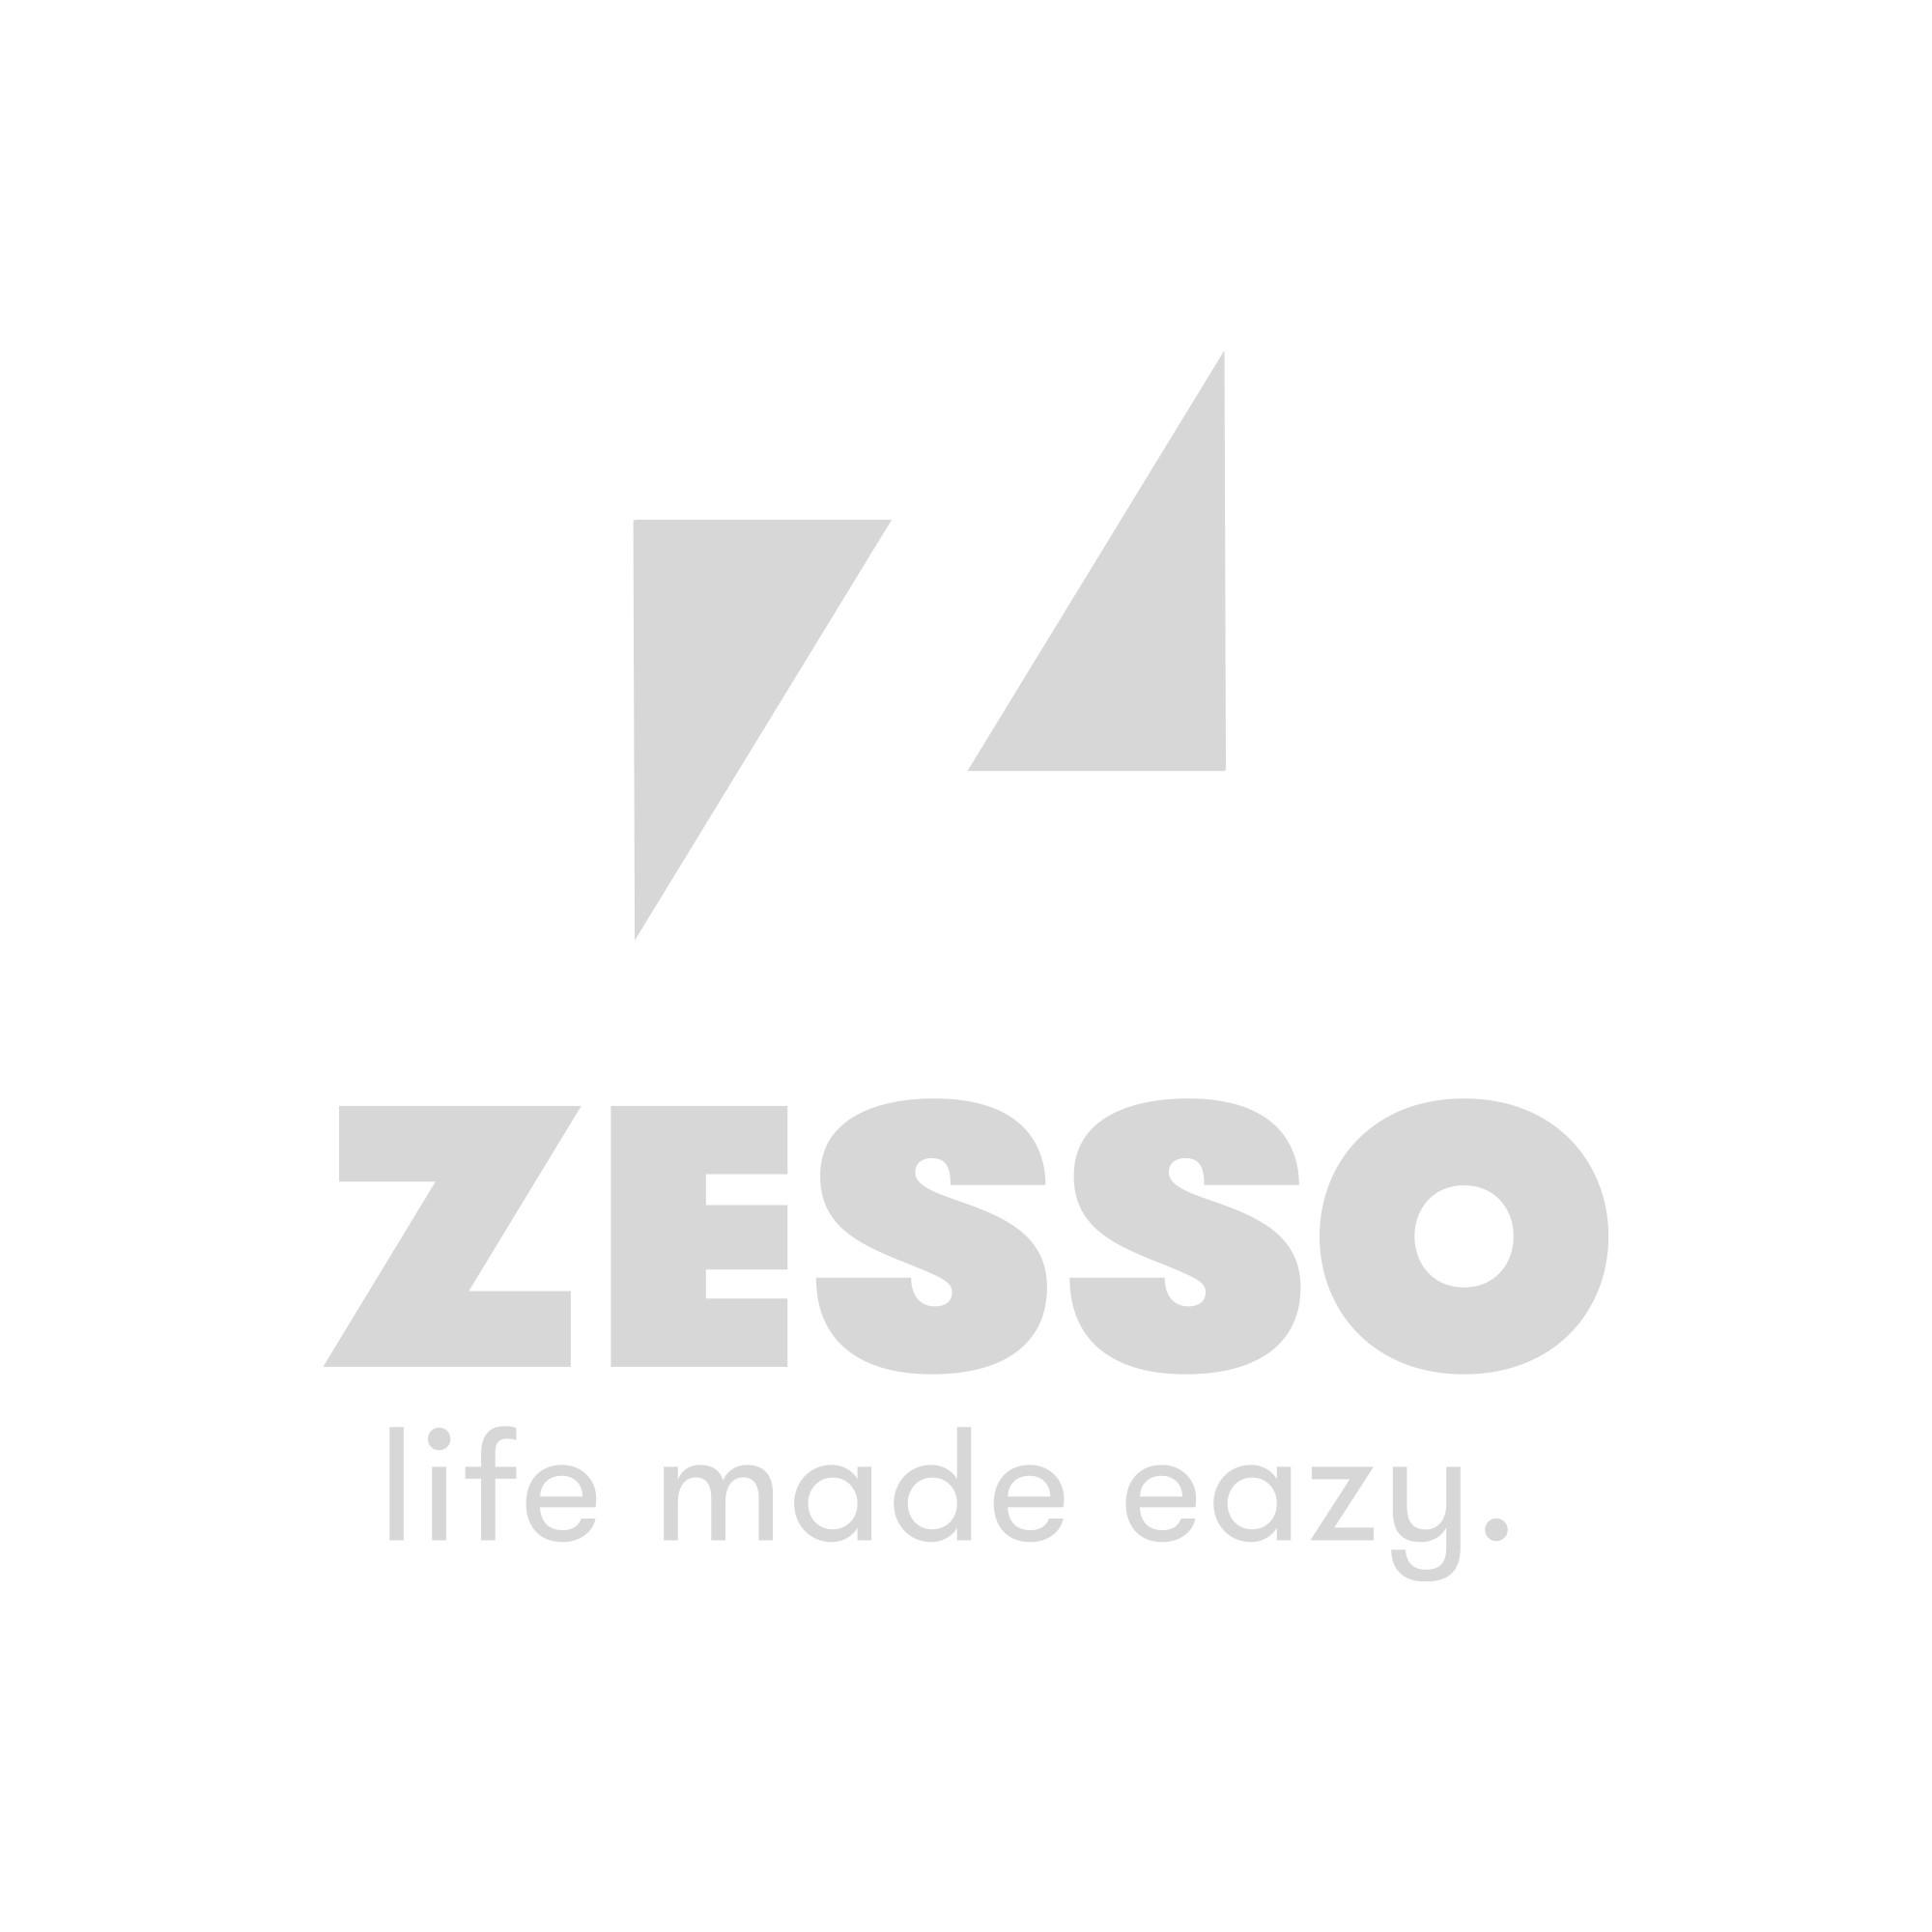 Jollein Wiegdeken Fancy Knit Soft Grey - 75 cm x 100 cm